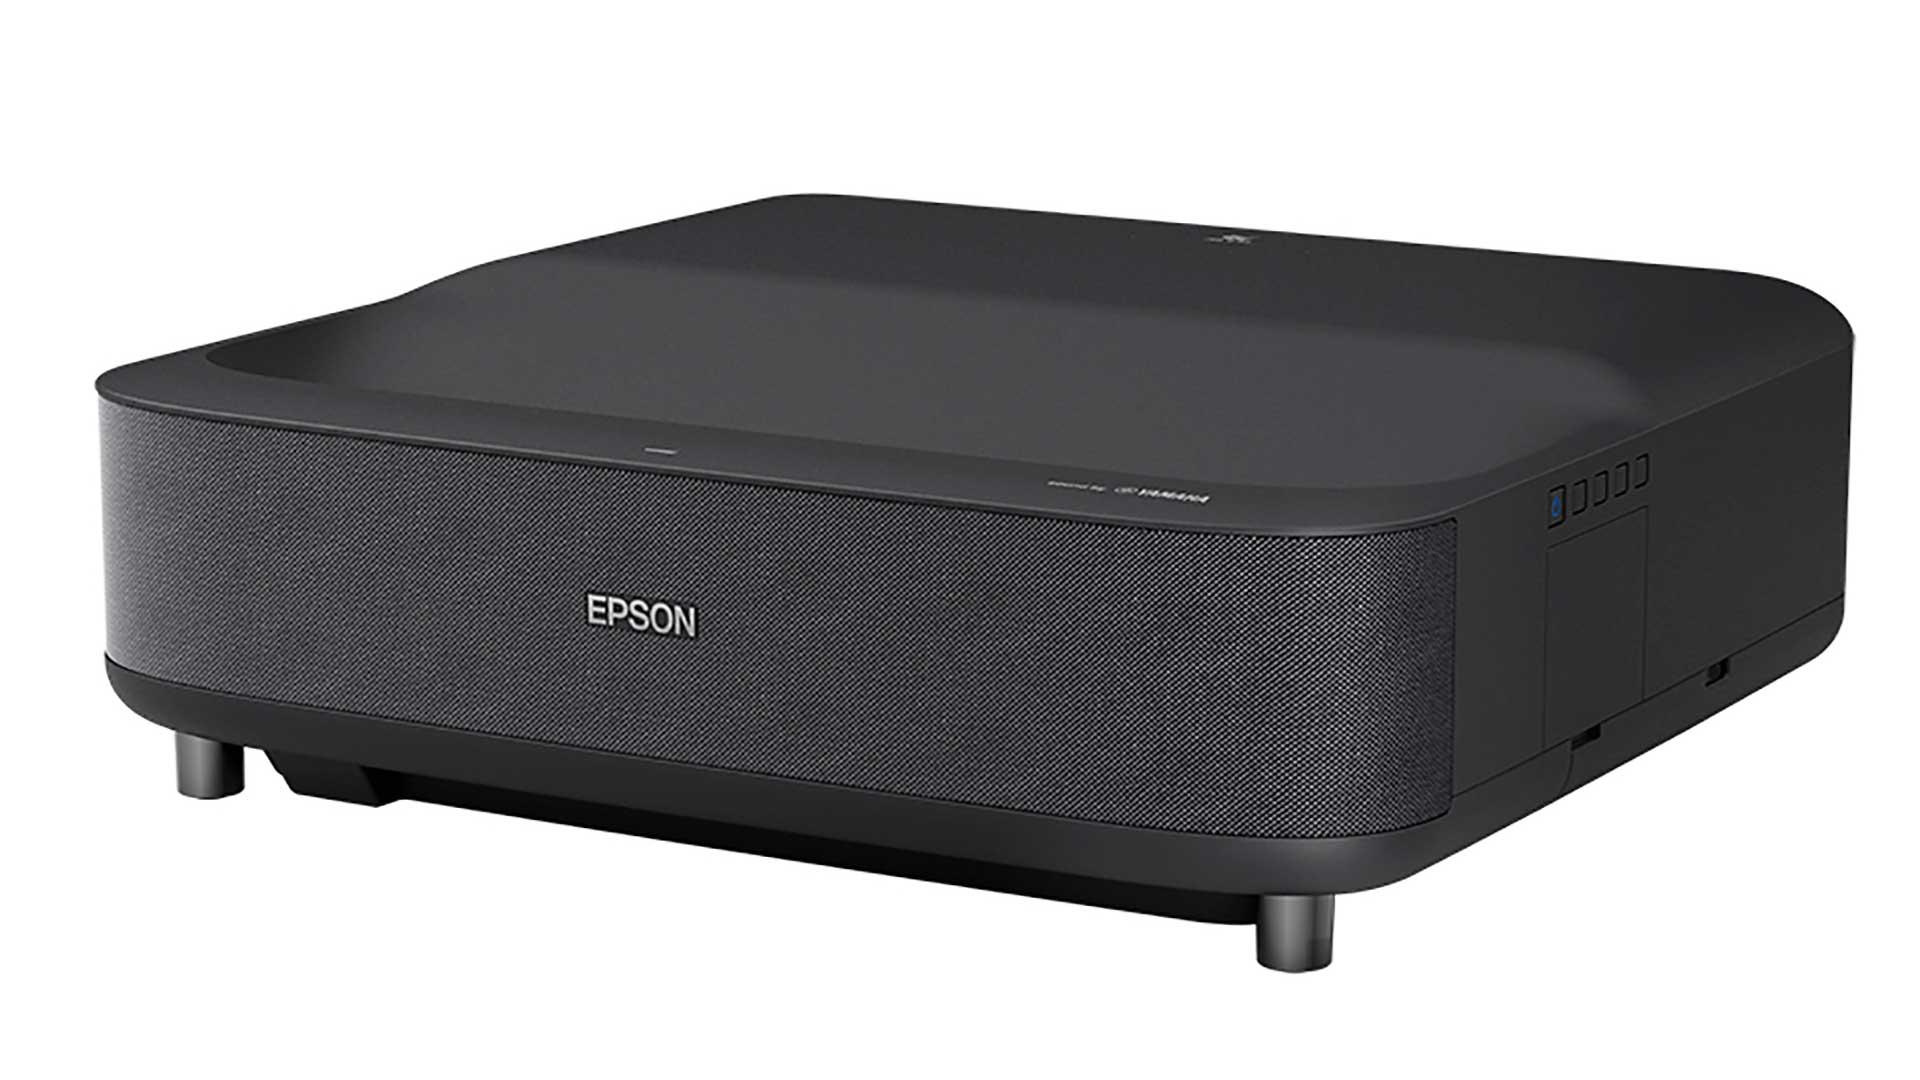 Epson - EH-LS300B Projection TV, Black